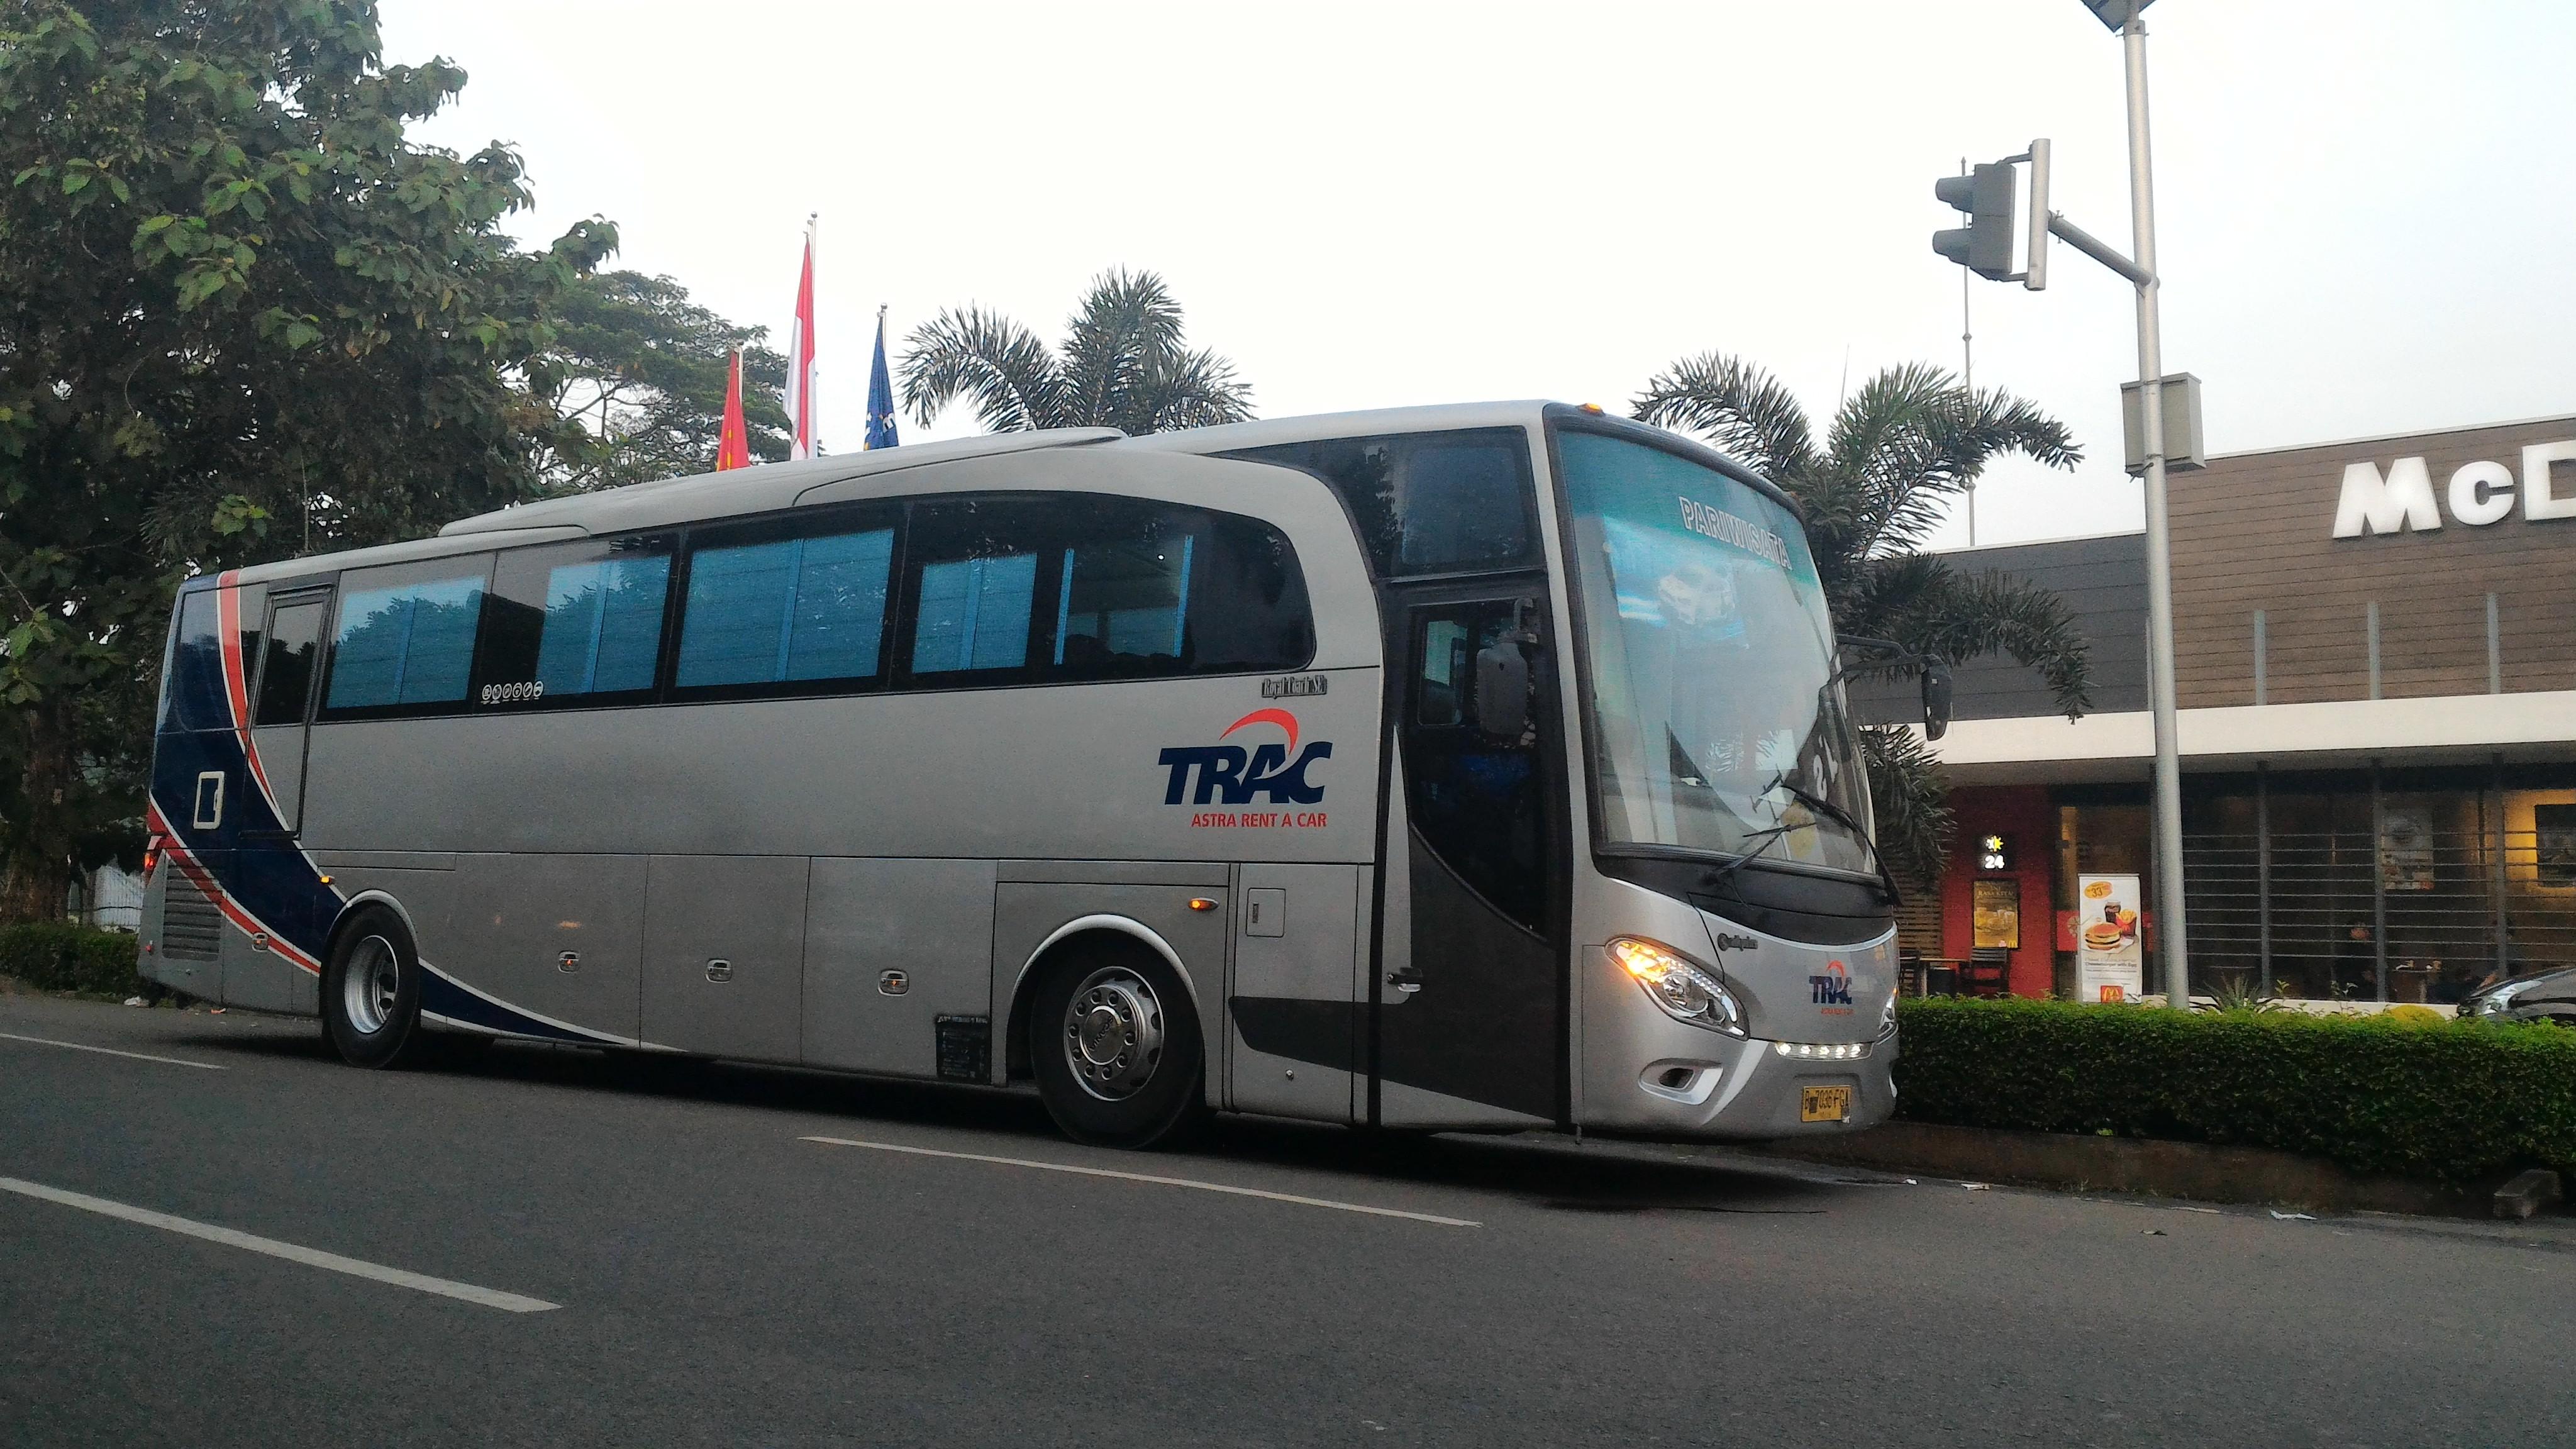 Trac - Panduan Lengkap Sewa Bus Luxury untuk Kenyamanan Perjalanan Anda